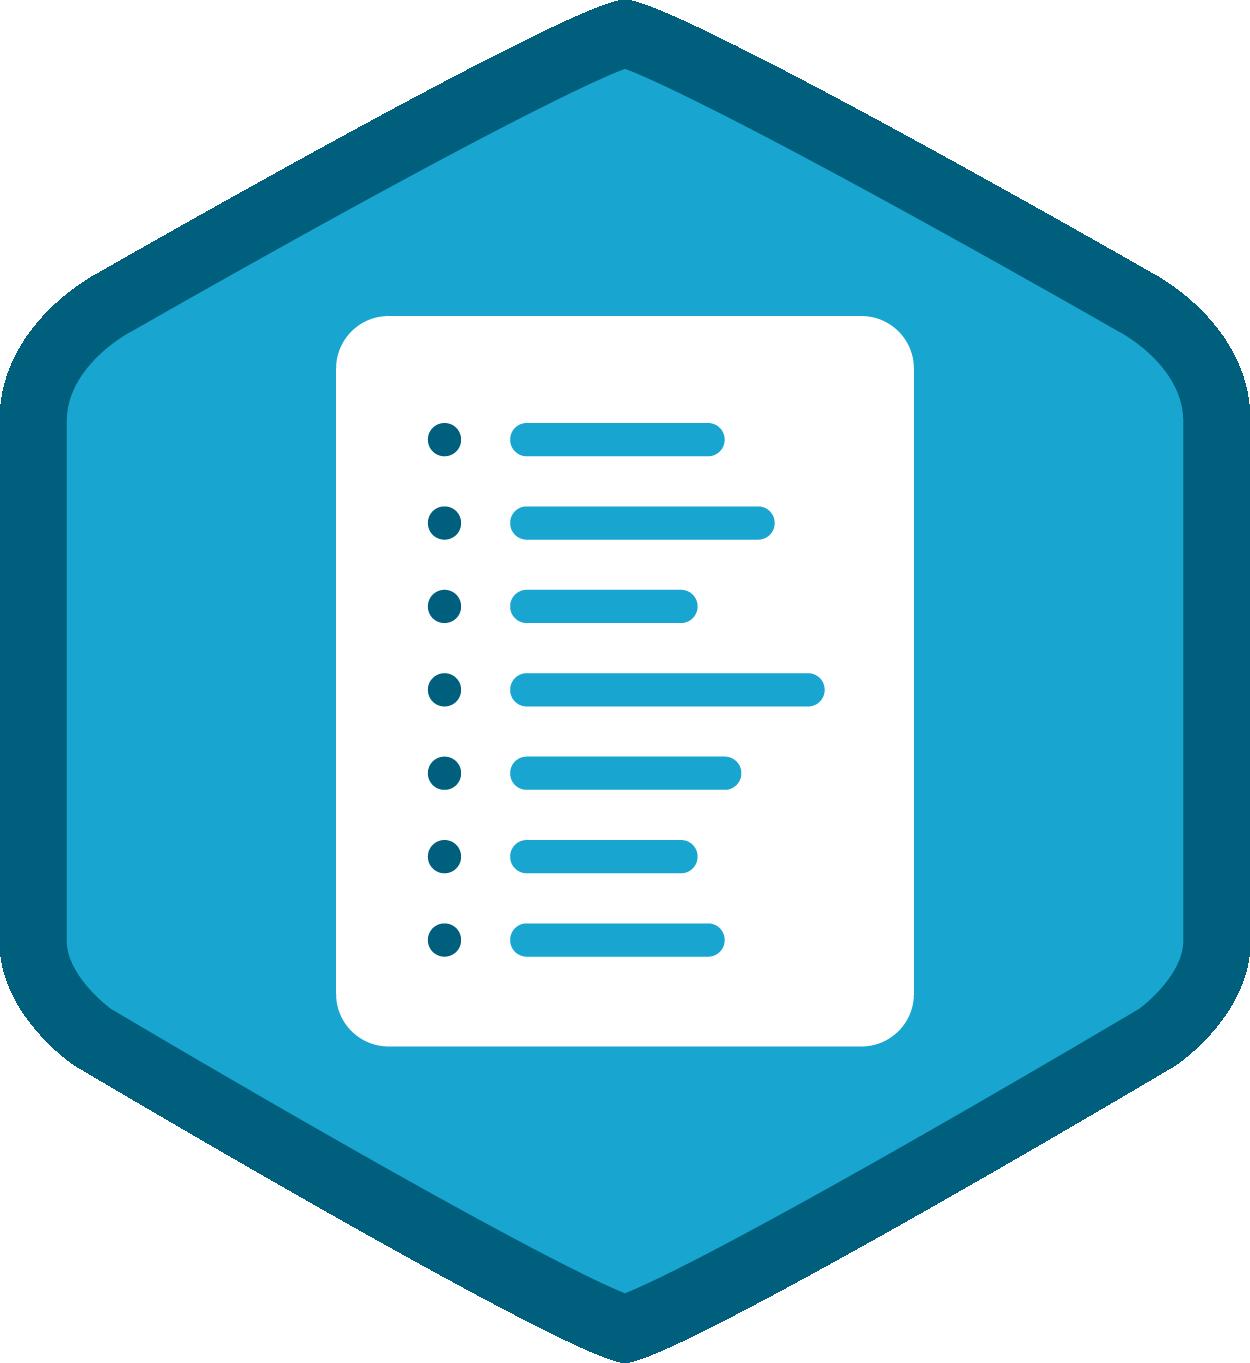 Creating a Data Model (ObjC)